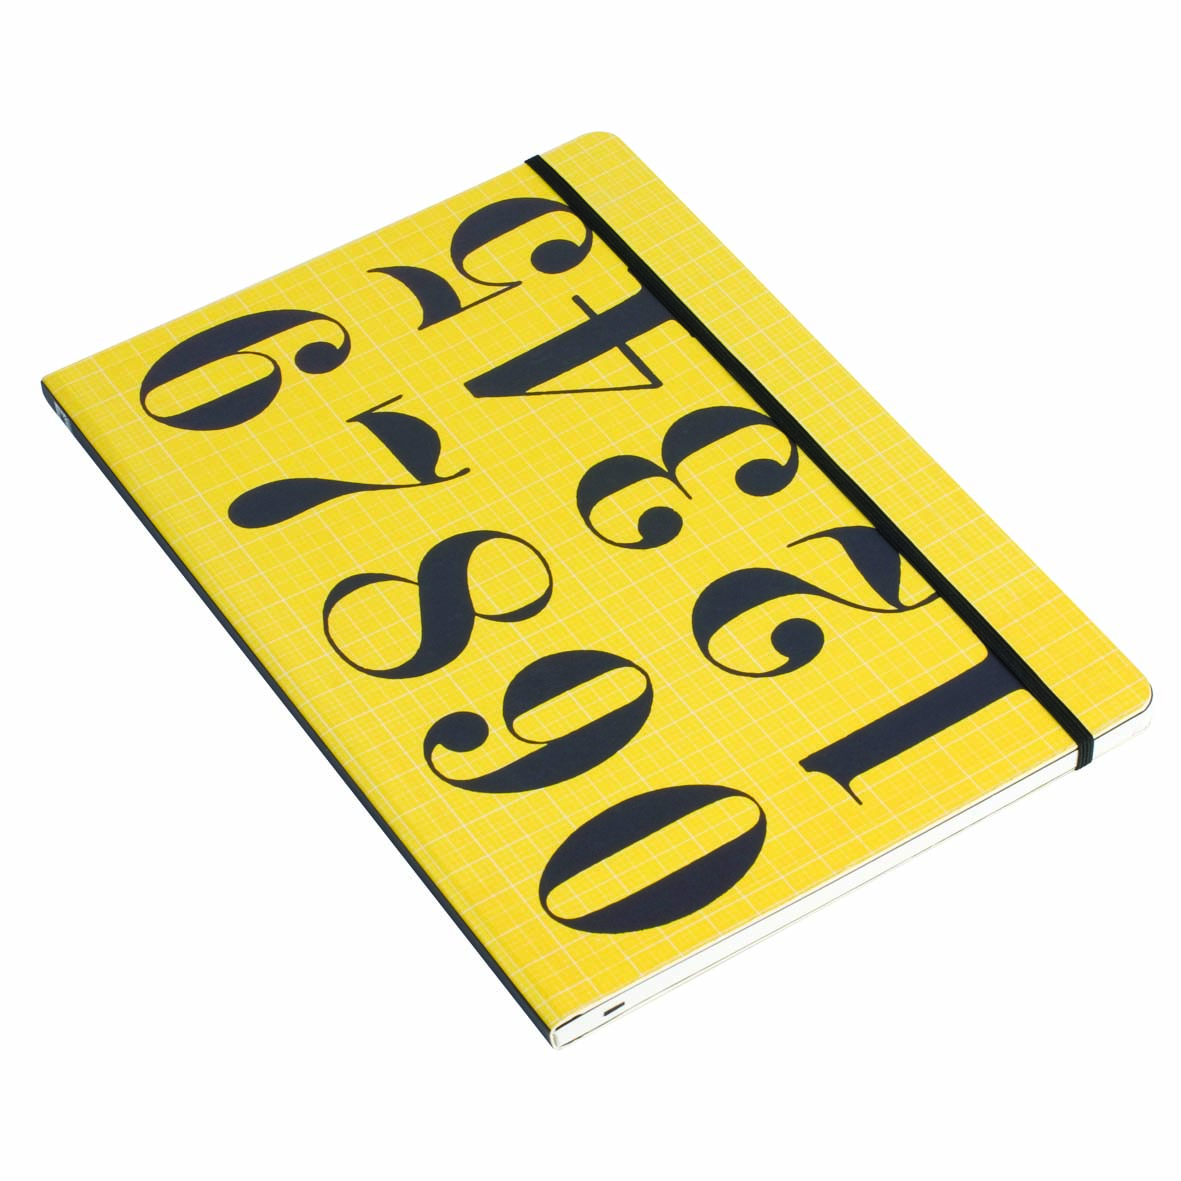 Boldly patterned notebook for desktop and commuting